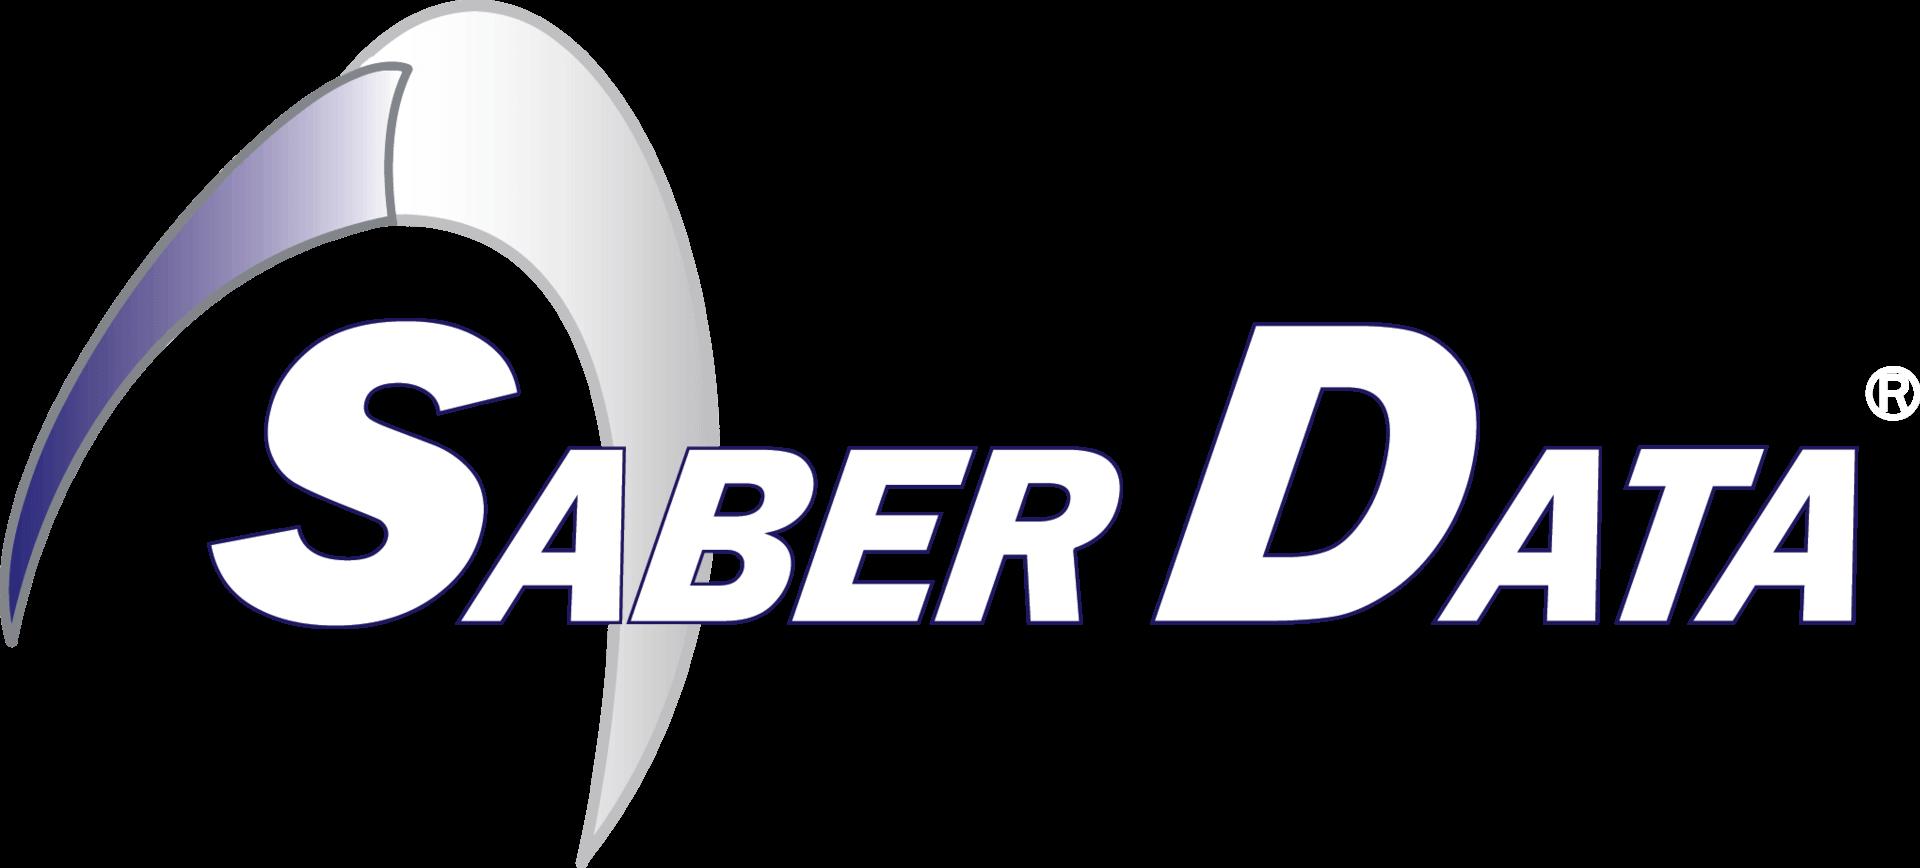 TyRex Logo: Saber Data - White